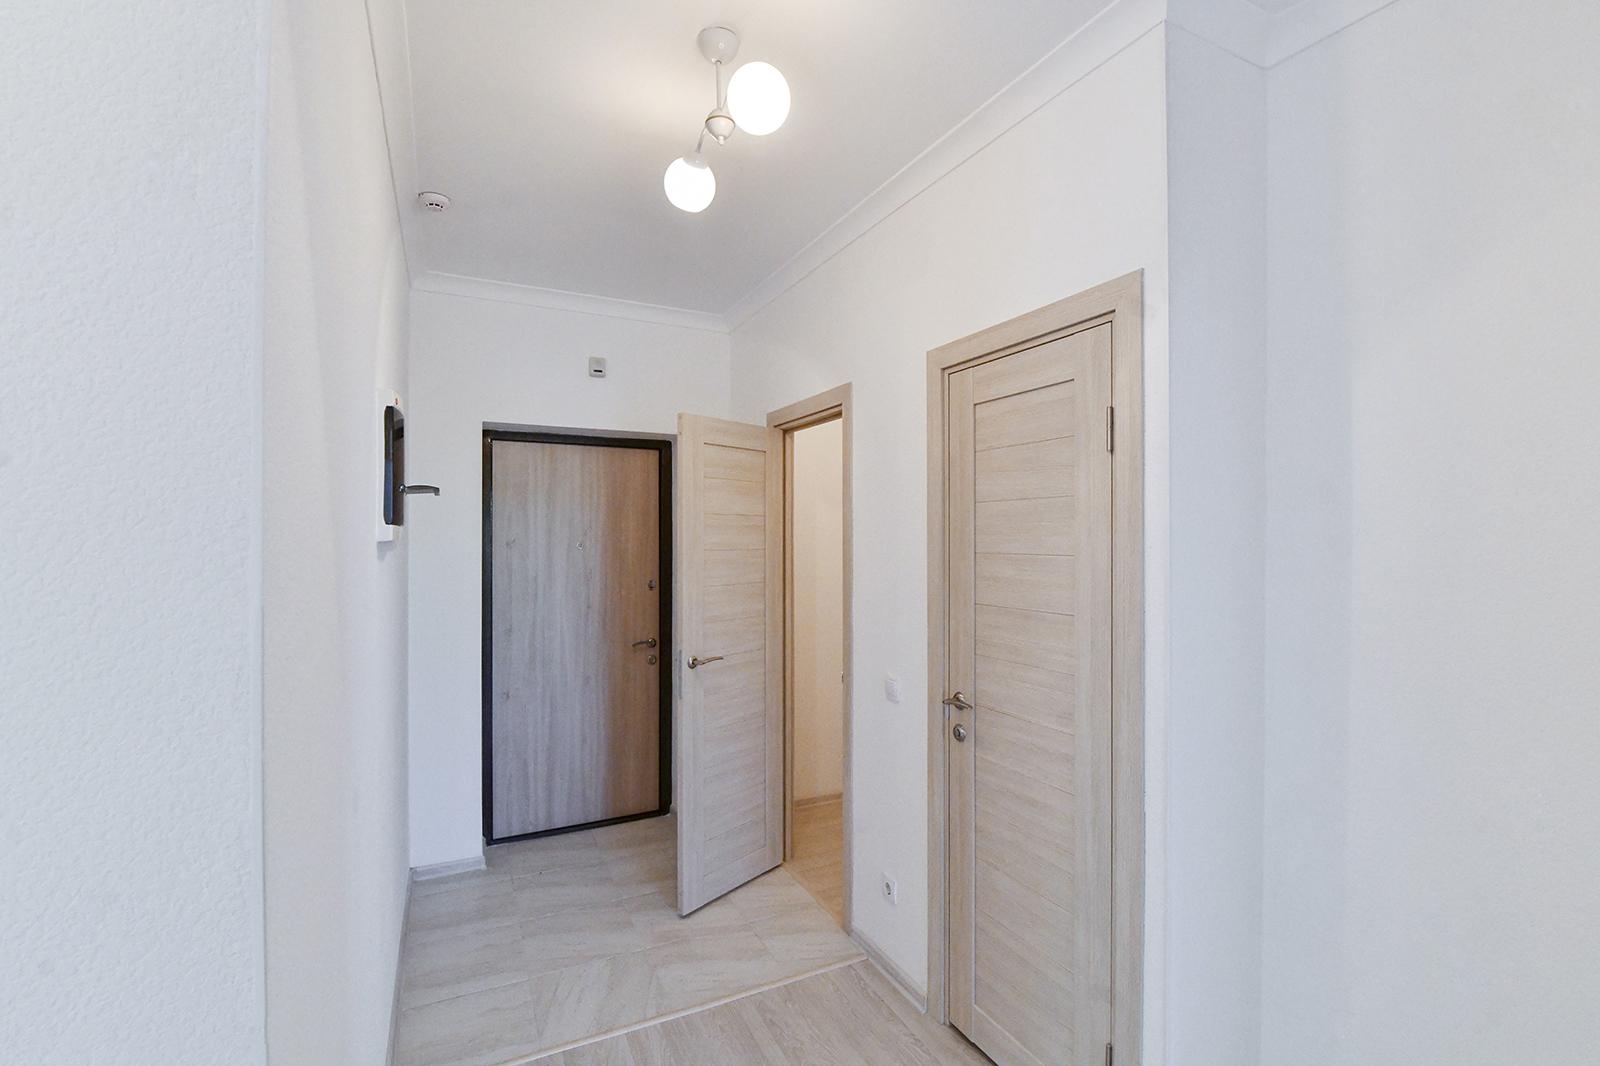 Программа реновации: в Текстильщиках построят дом на 140 квартир